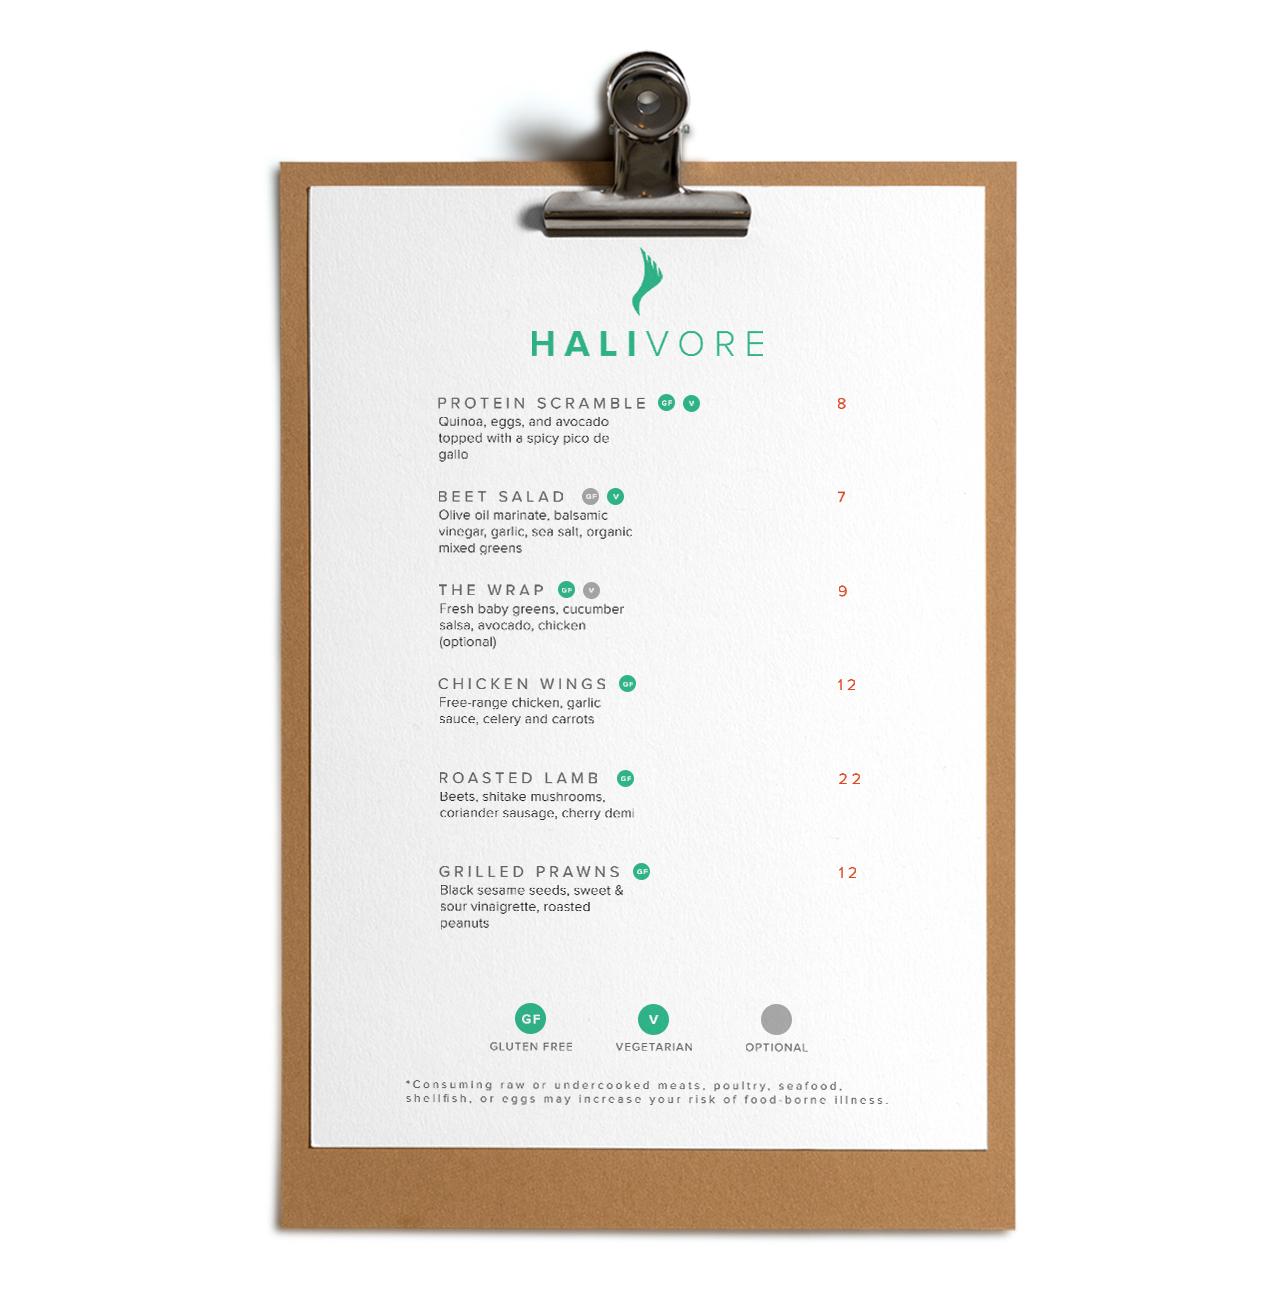 halivore_menu_mockup2